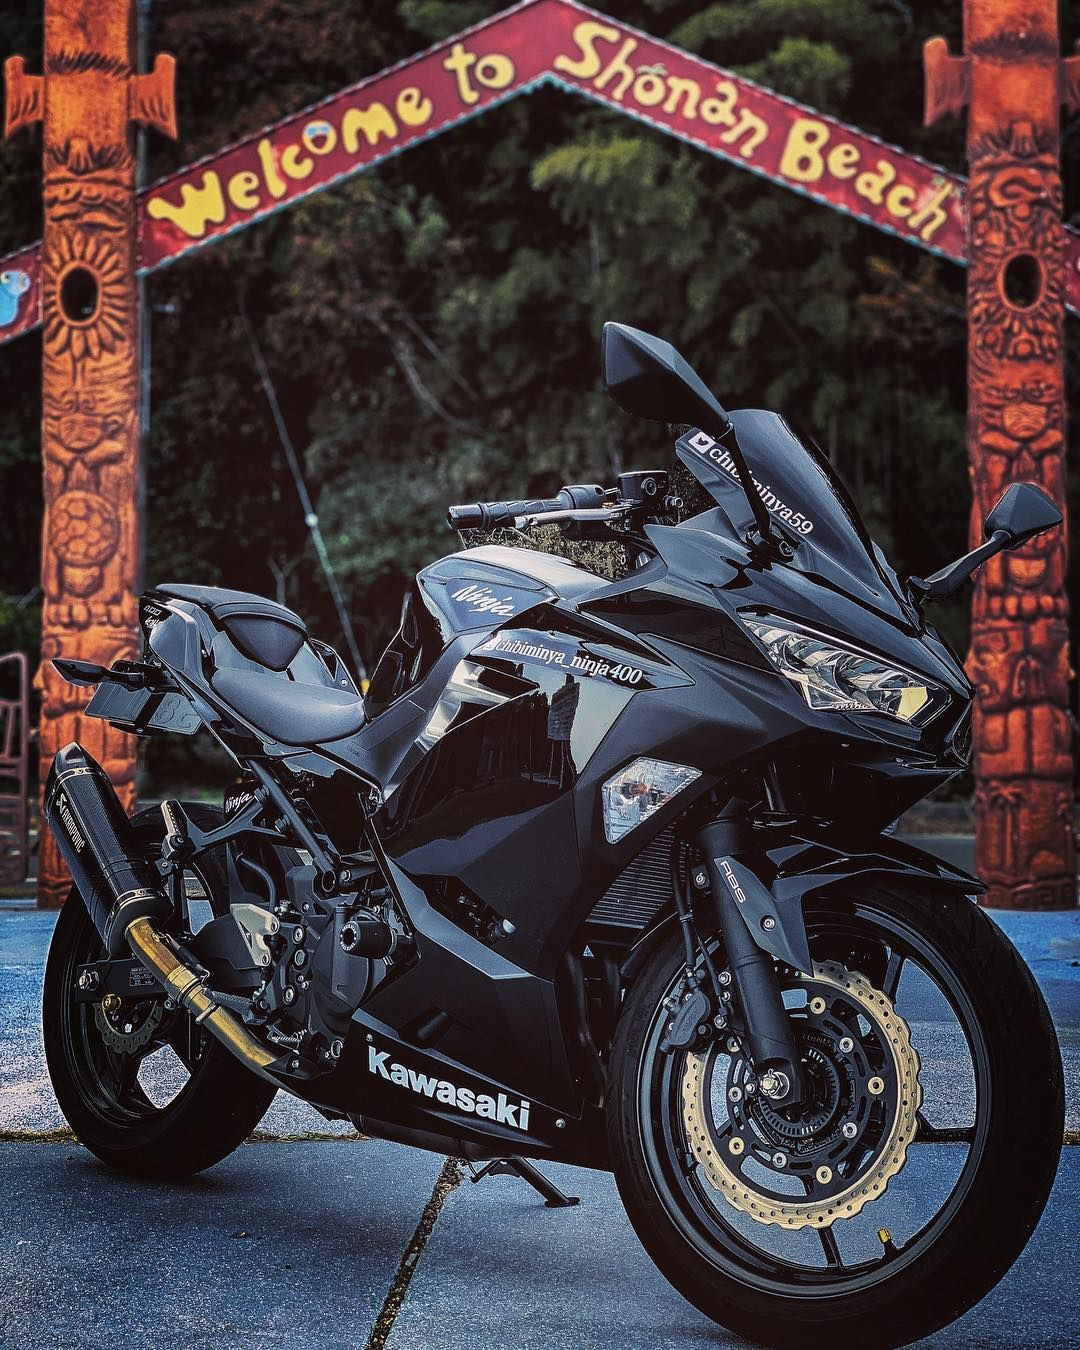 NINJA vinyl decal 1 set Kawasaki SPORT BIKE motor cycle crotchrocket